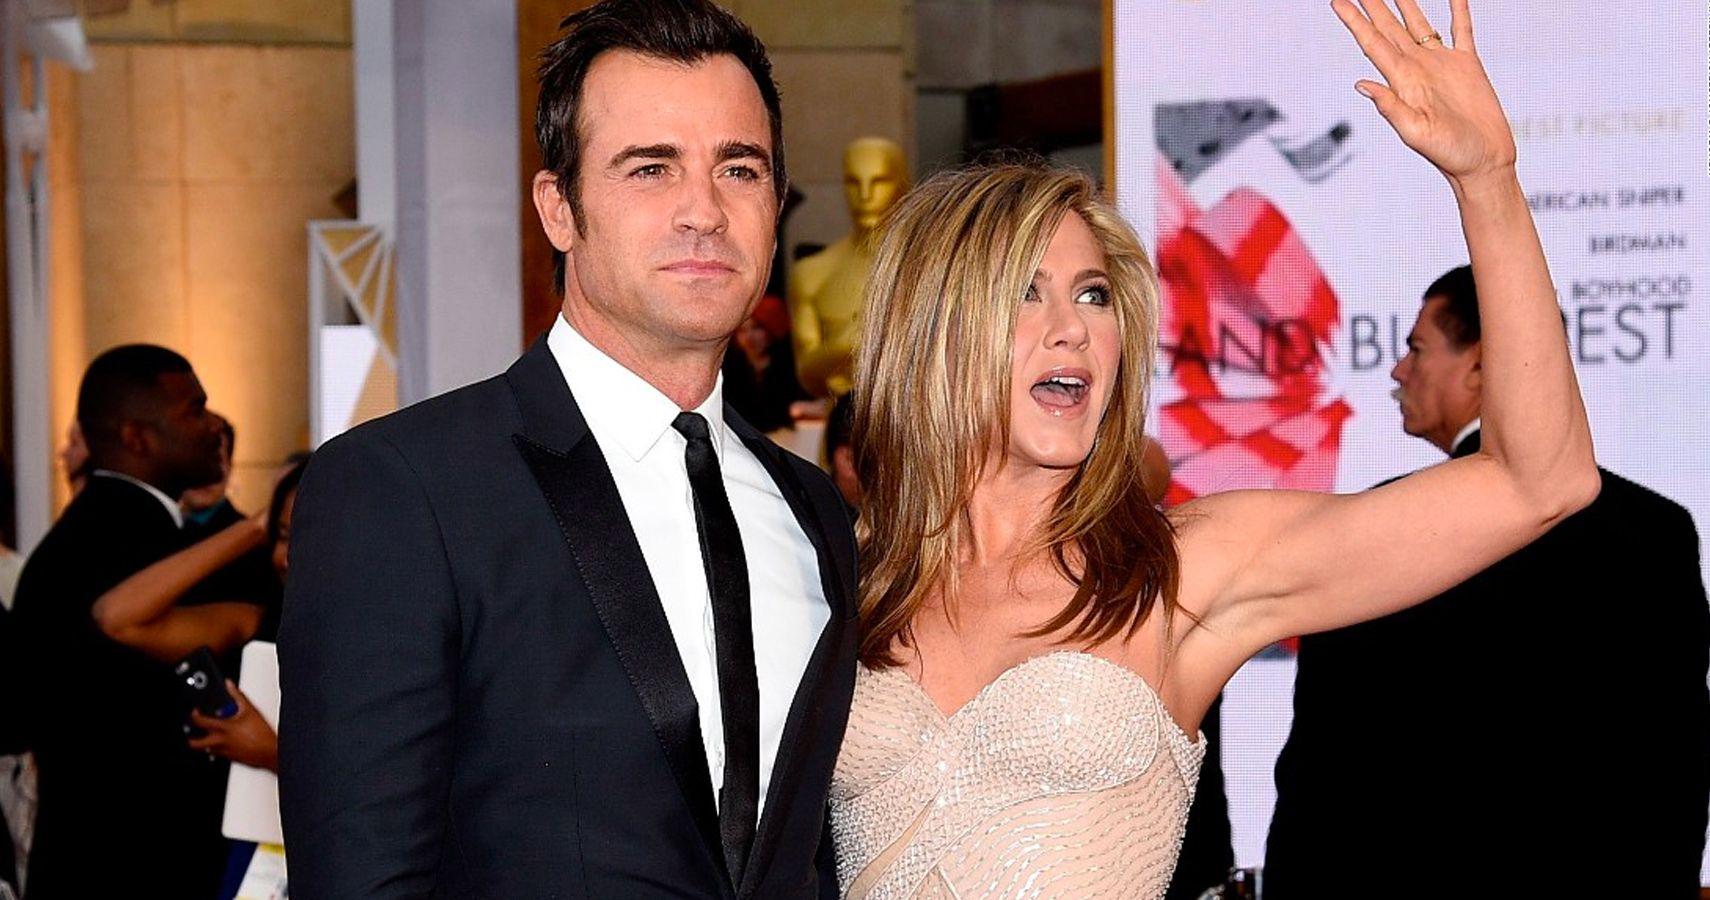 Jennifer Aniston's Failed Marriage Was A Hoax